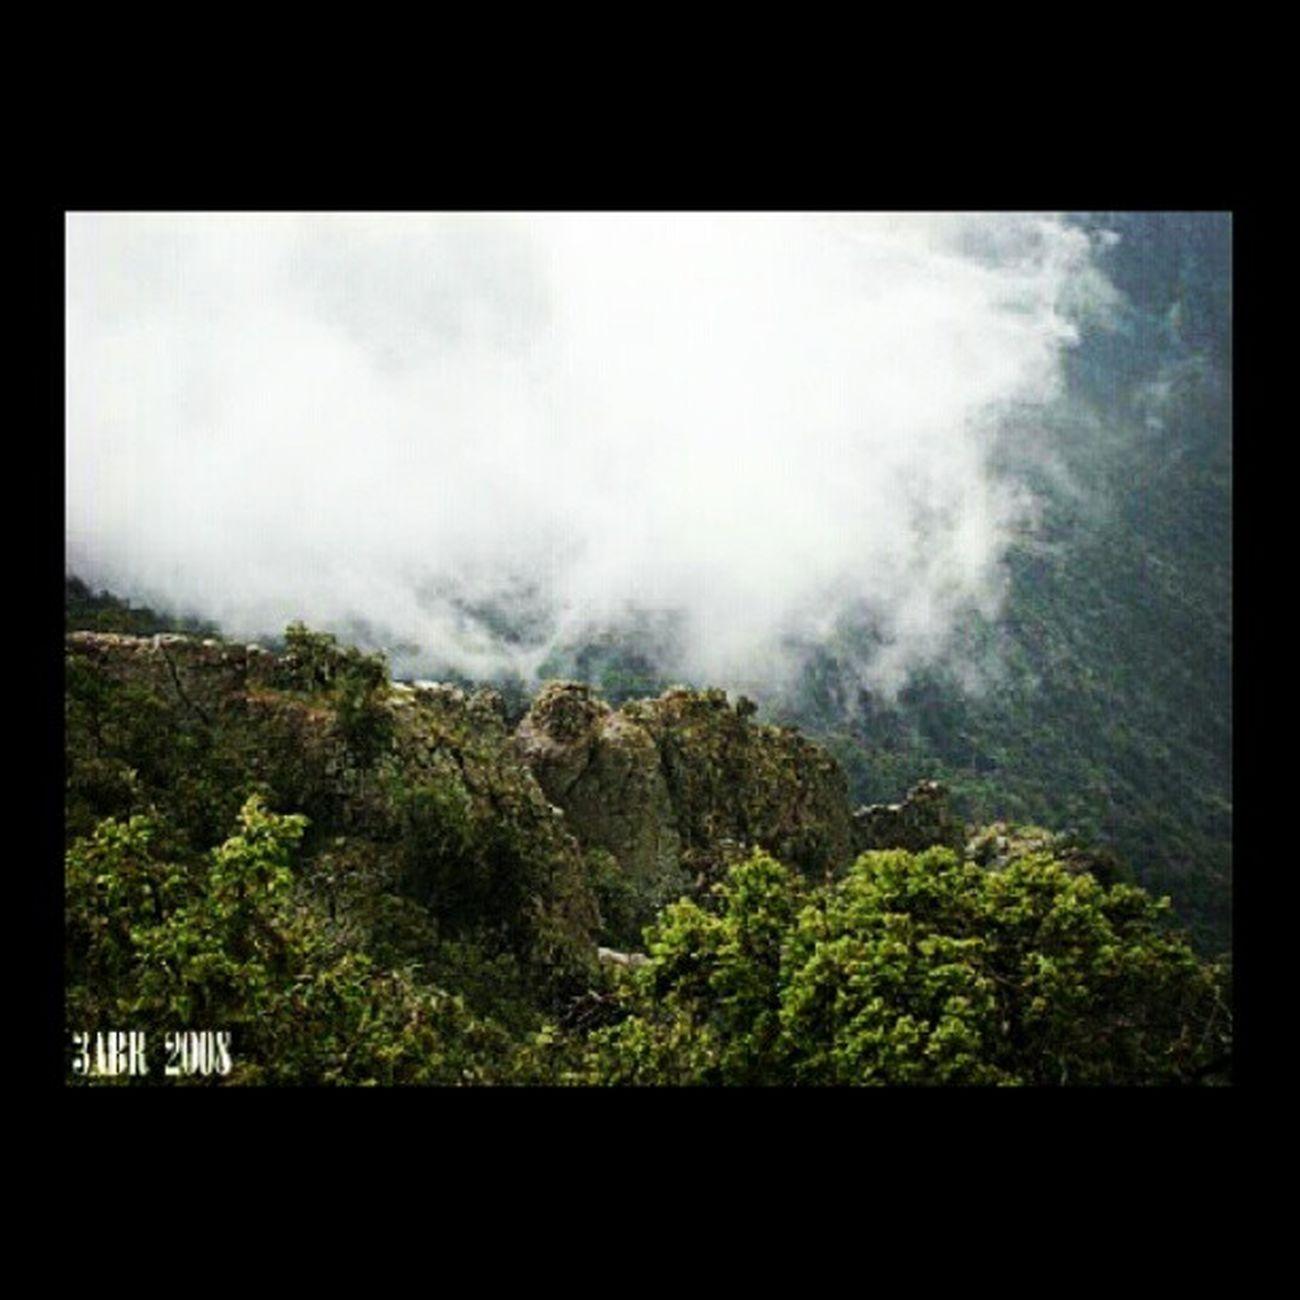 جبال ابها أبها ساب المزن غابة Forest Mountains Abha pull trees